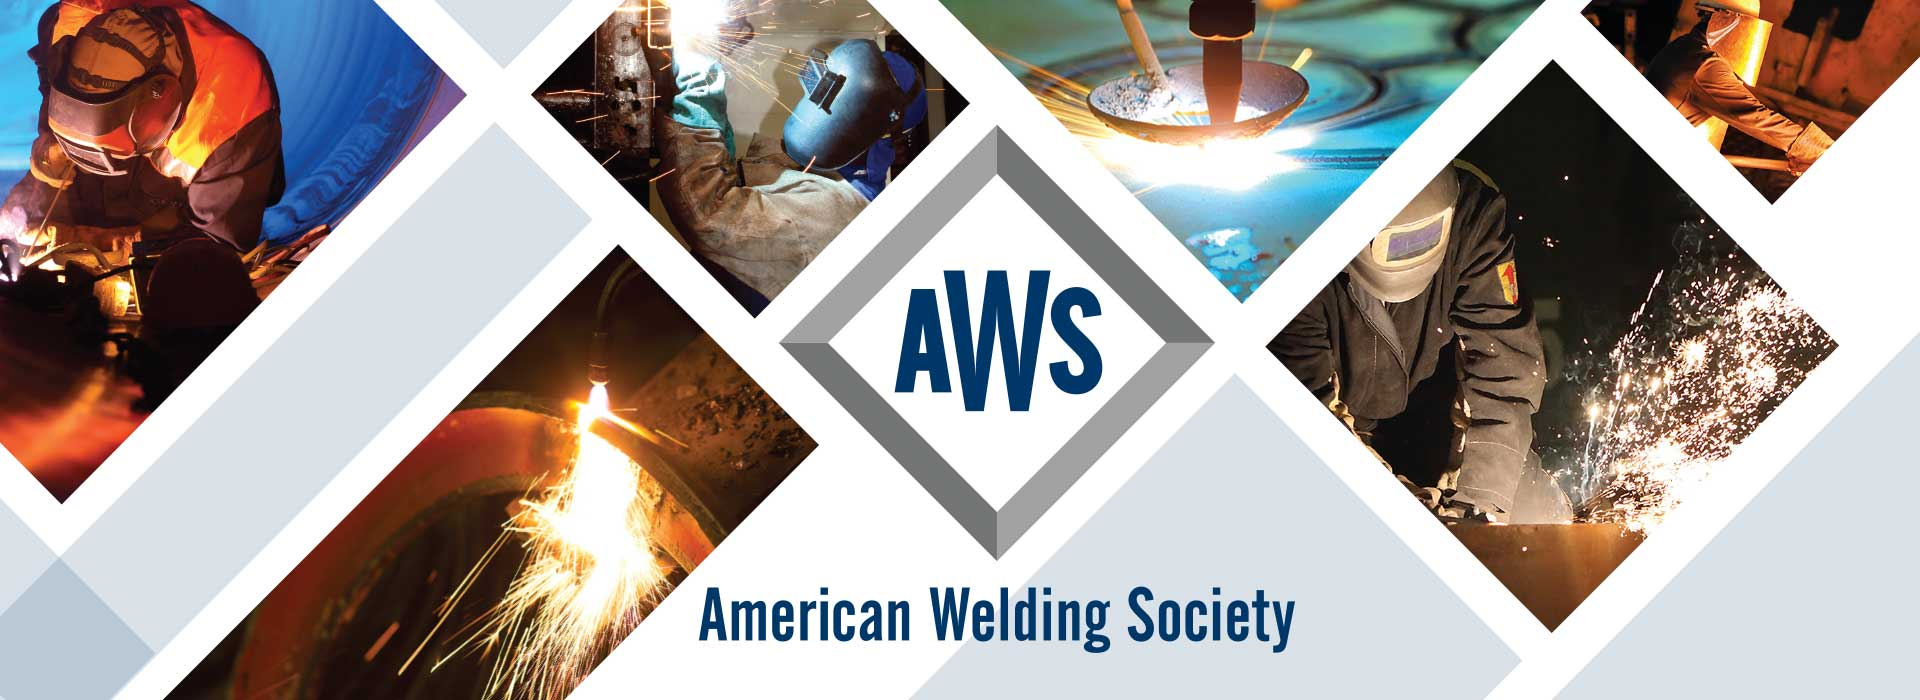 American Welding Society Inspire A New Generation Of Welders